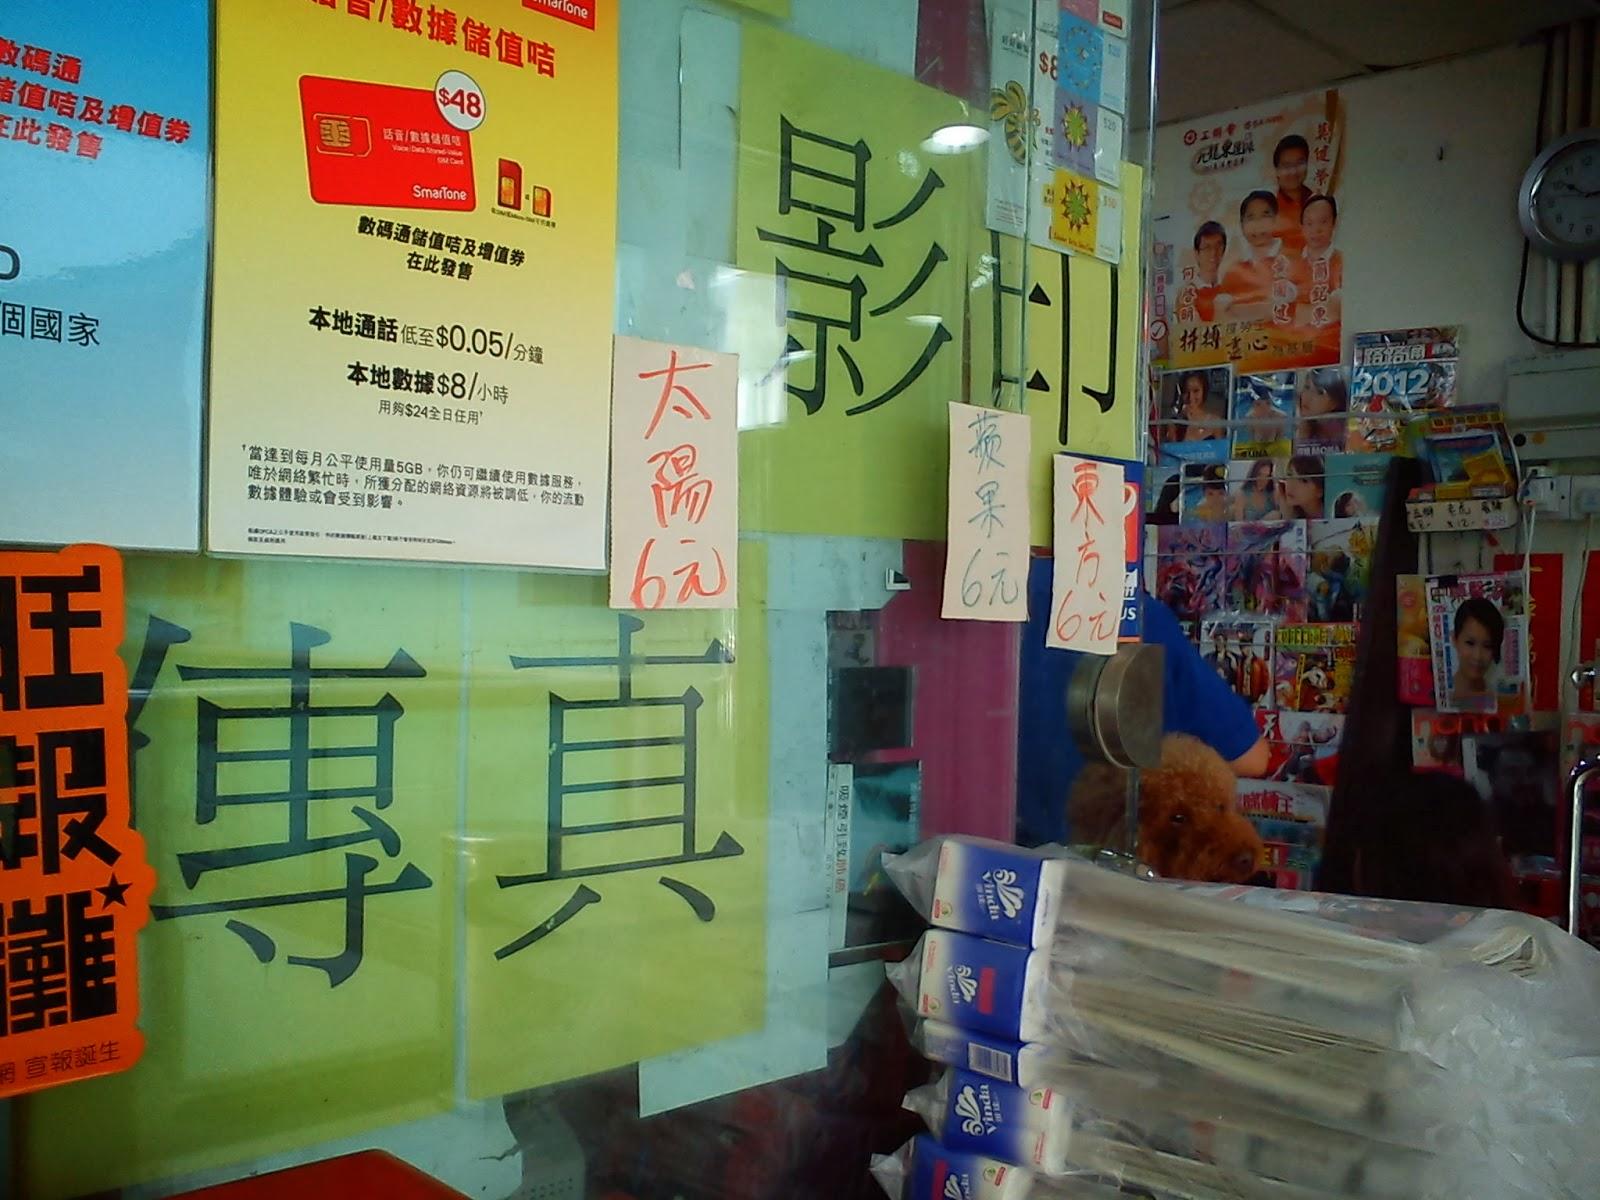 Grassroots O2: 巡視業務.領匯.平田商場 @2012-09-01